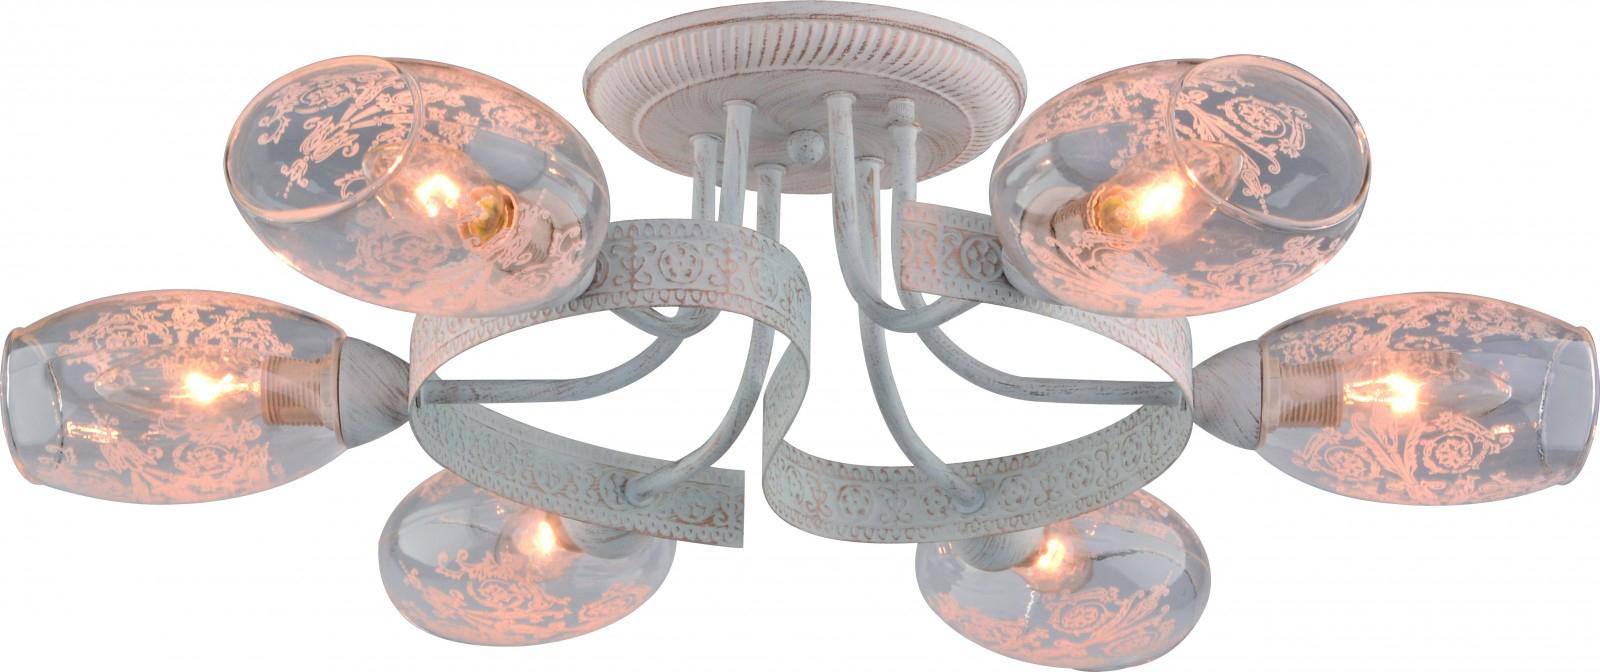 Светильник потолочный Arte Lamp Bettina, 6 х E14, 40 W. A1296PL-6WGA1296PL-6WG